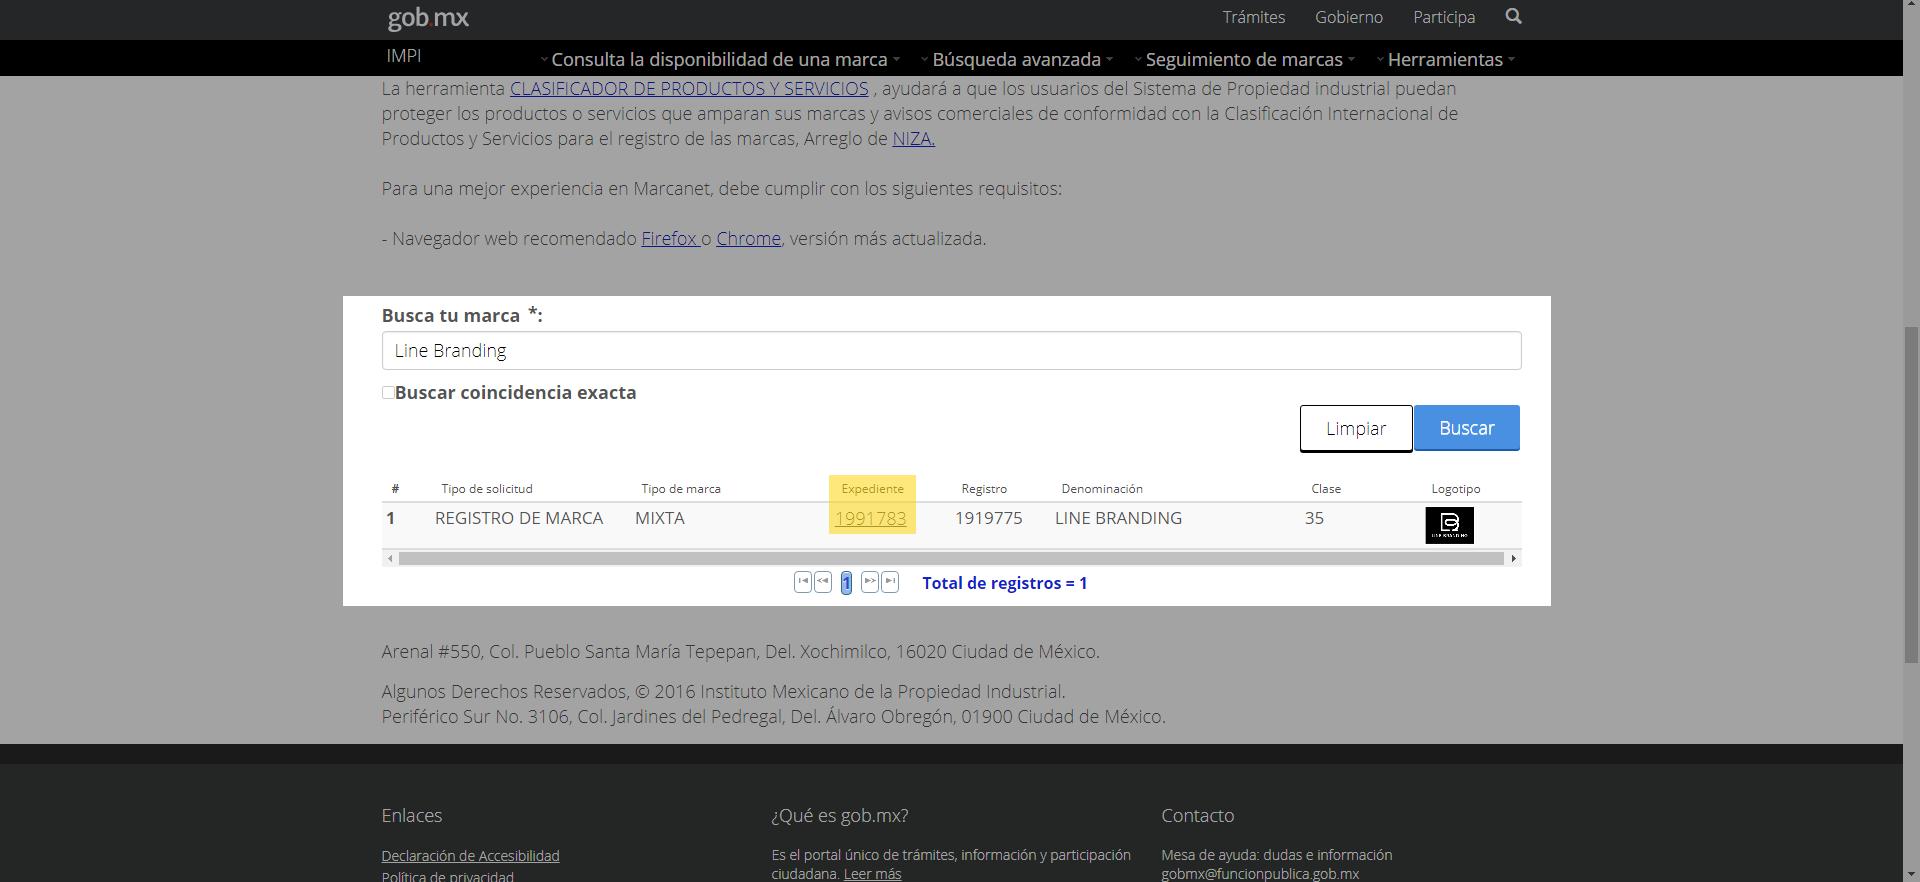 marcanet, página web de registra de marca en IMPI